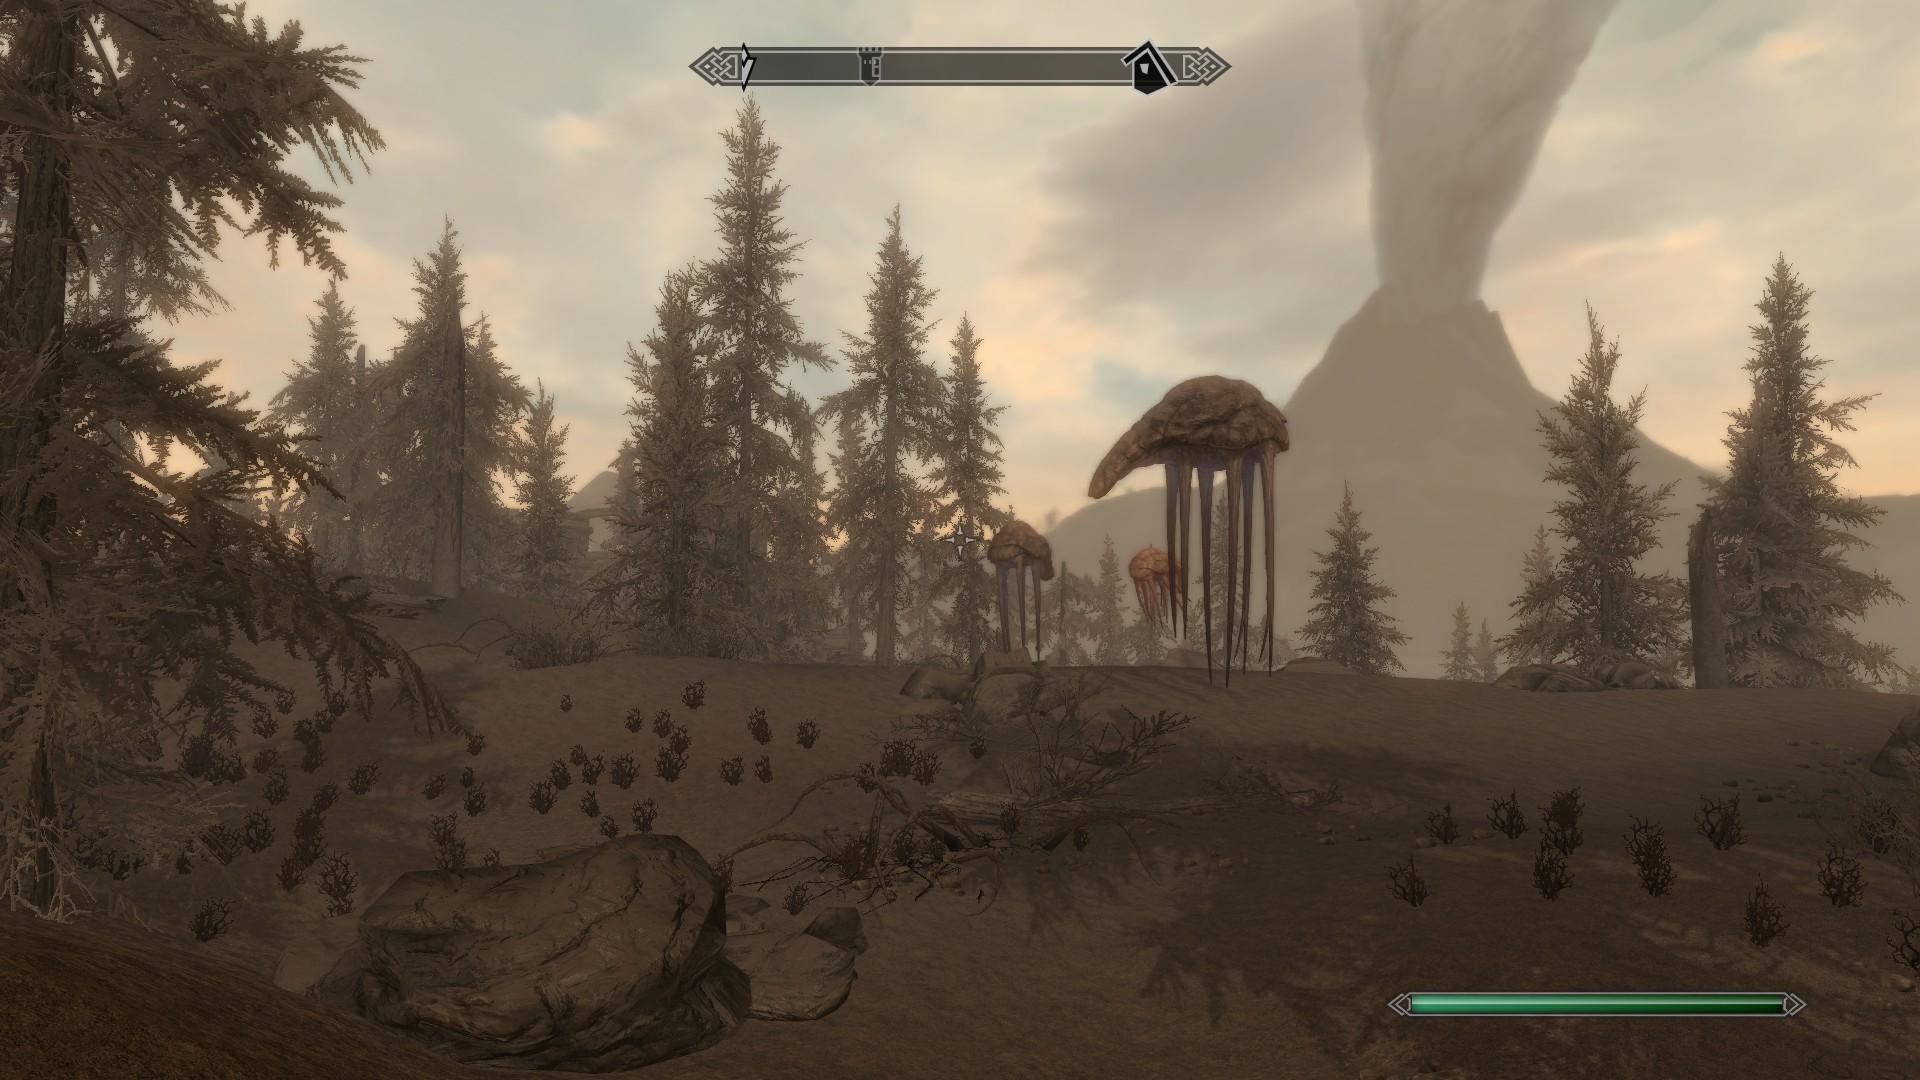 dragonborn-skyrim-dlc-006-der-vulkan-auf-morrwowind